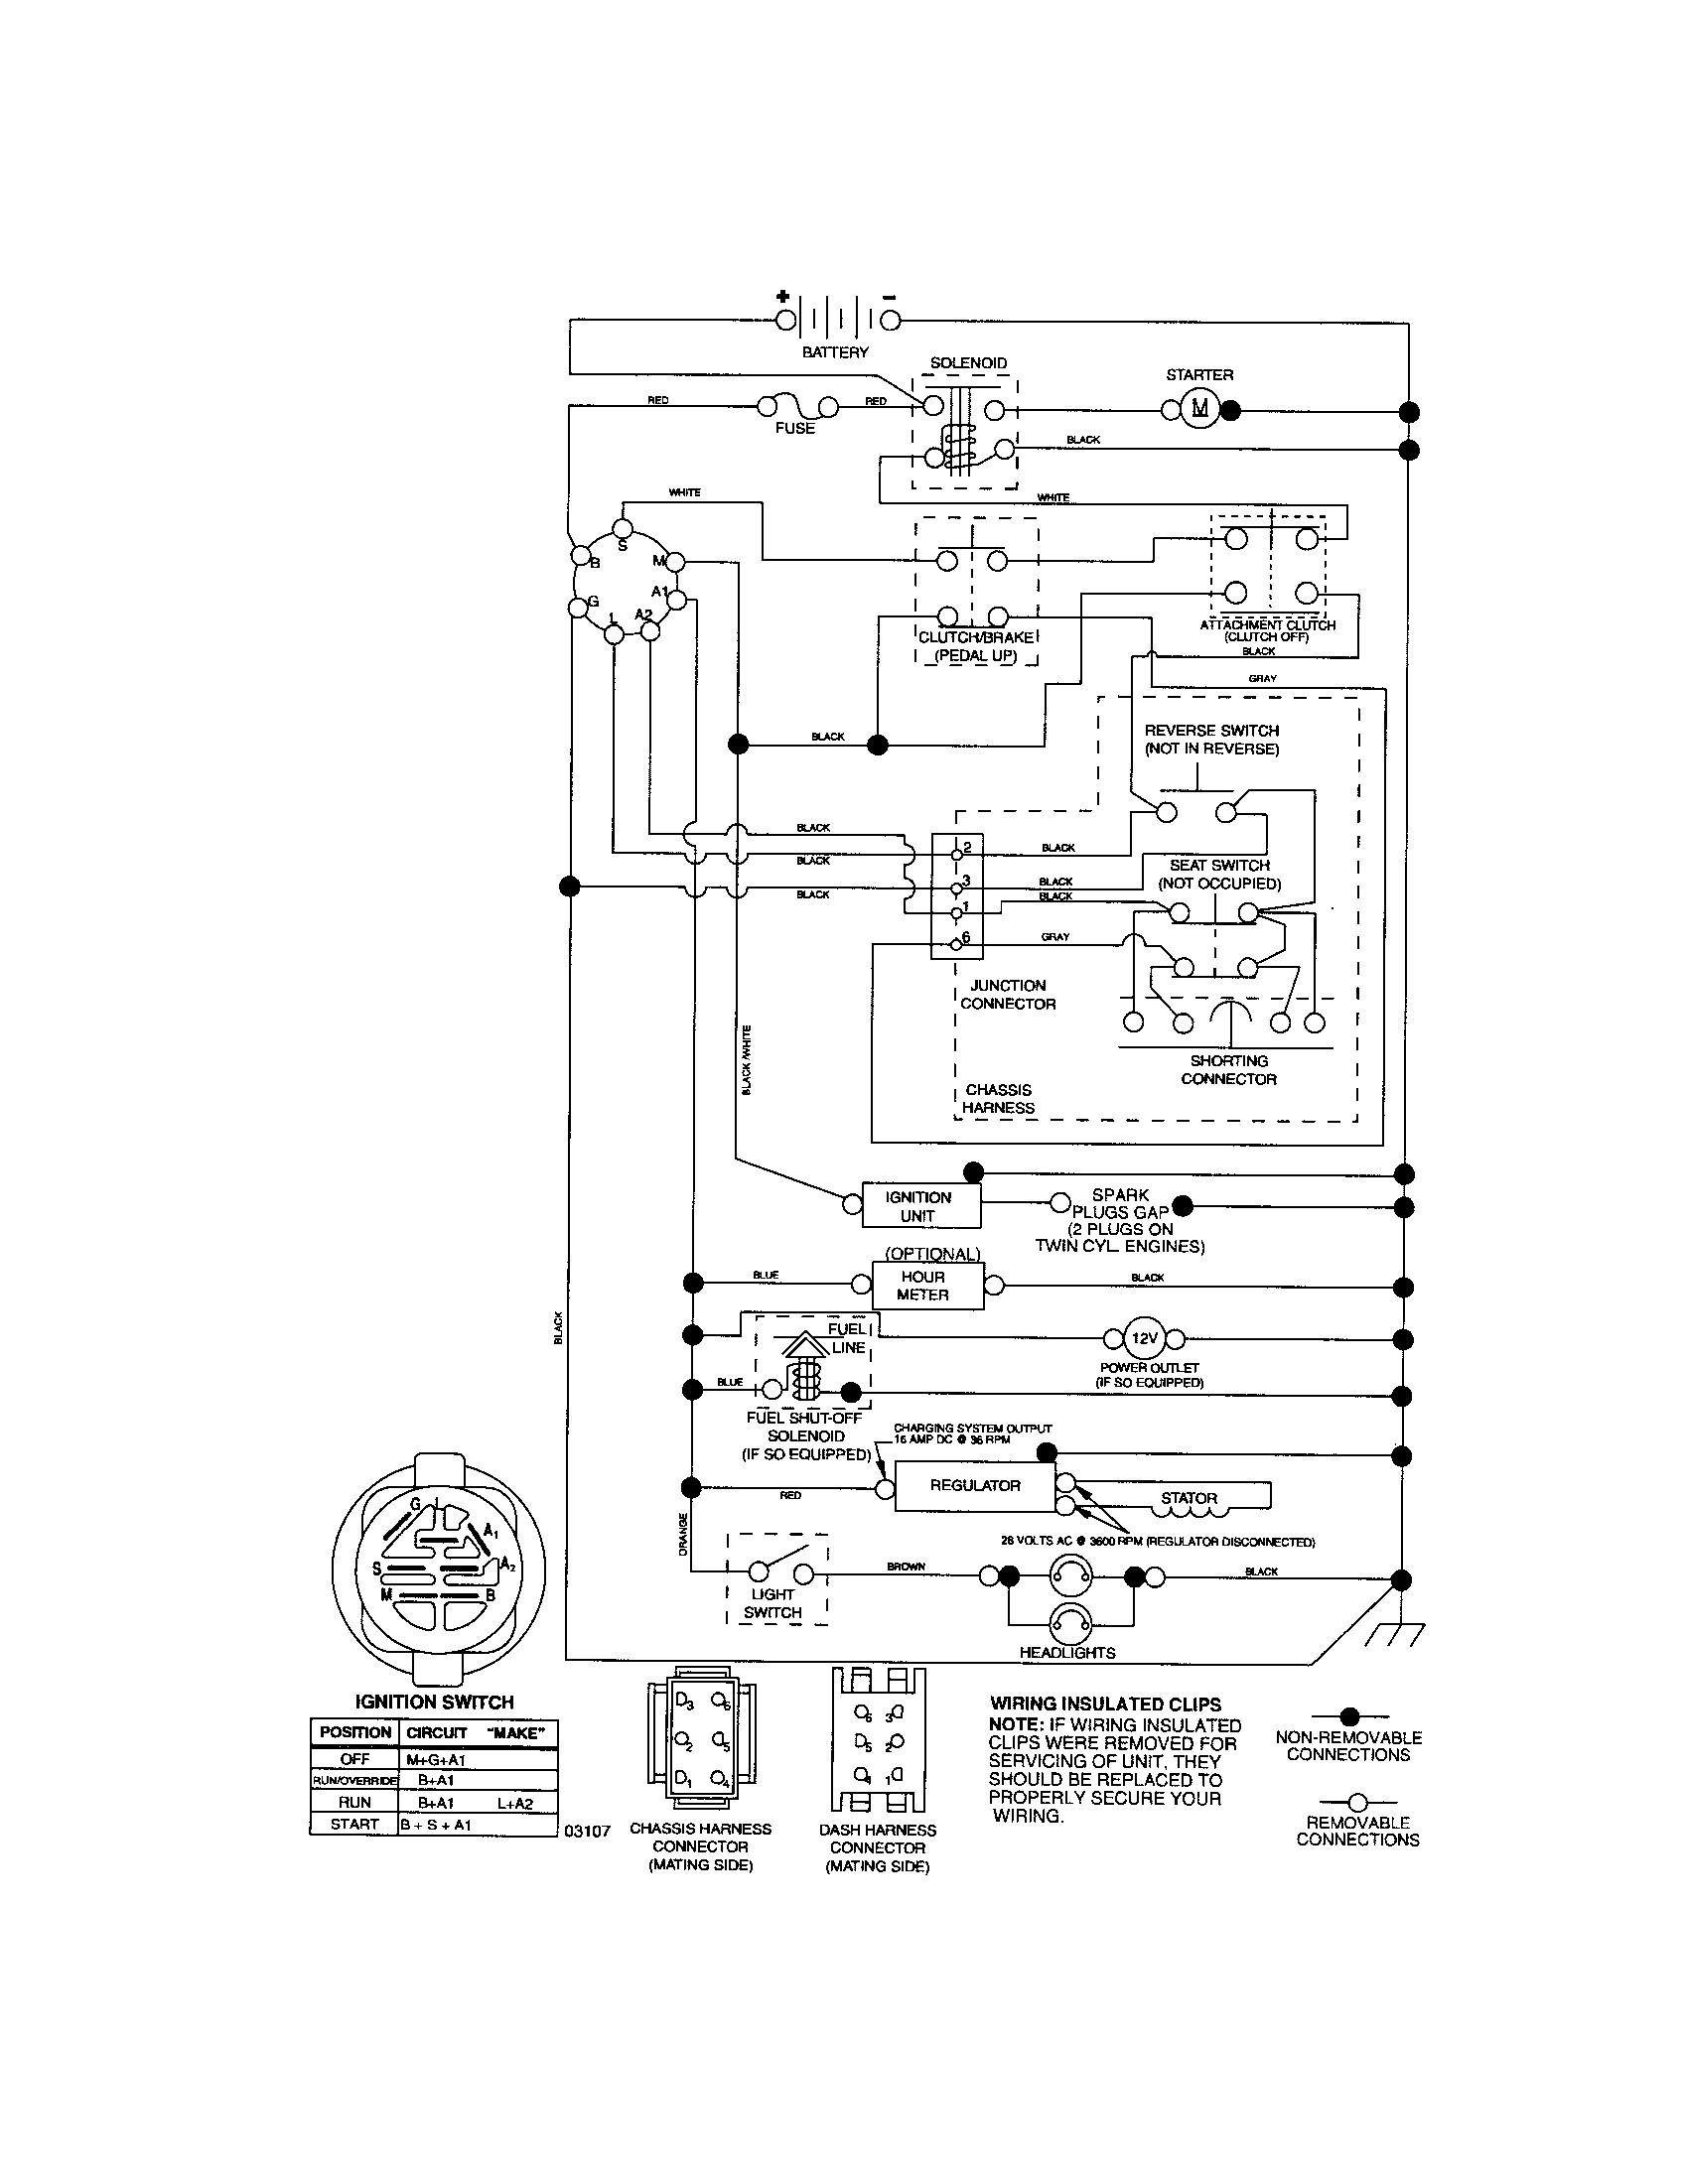 Wiring Manual Wheel Horse Garden Tractor Wire